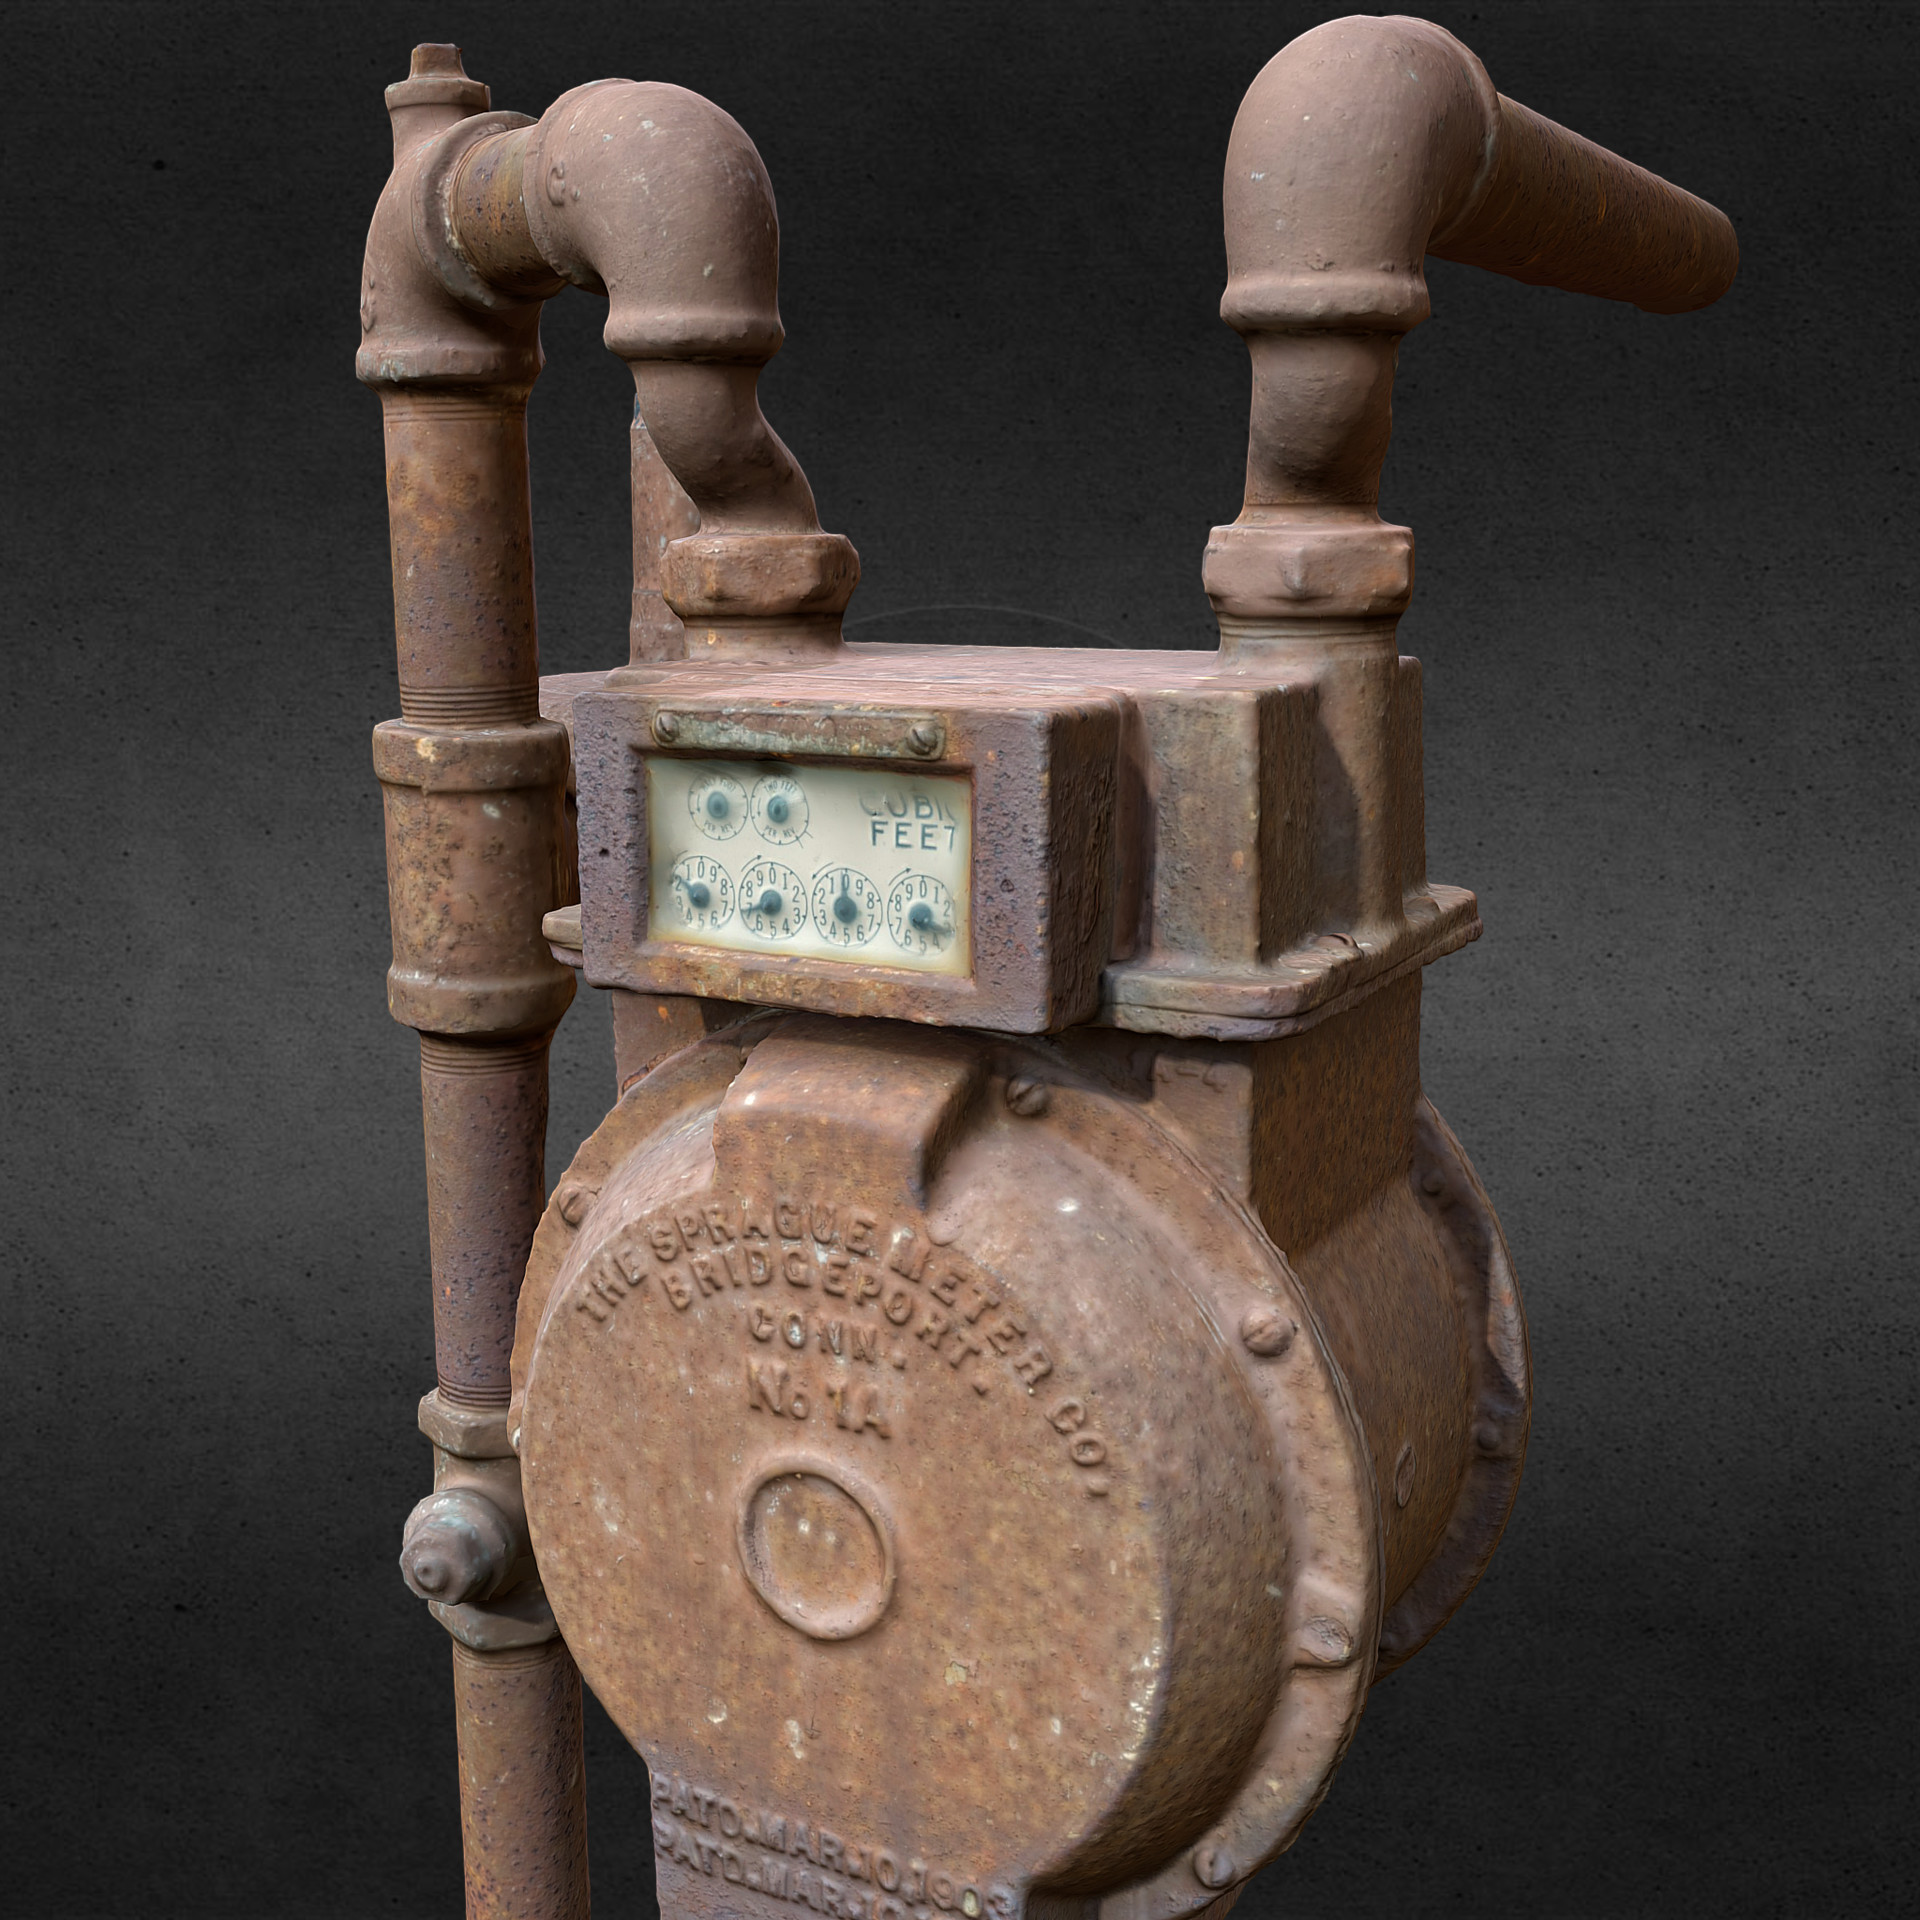 Andre bond gas meter 2